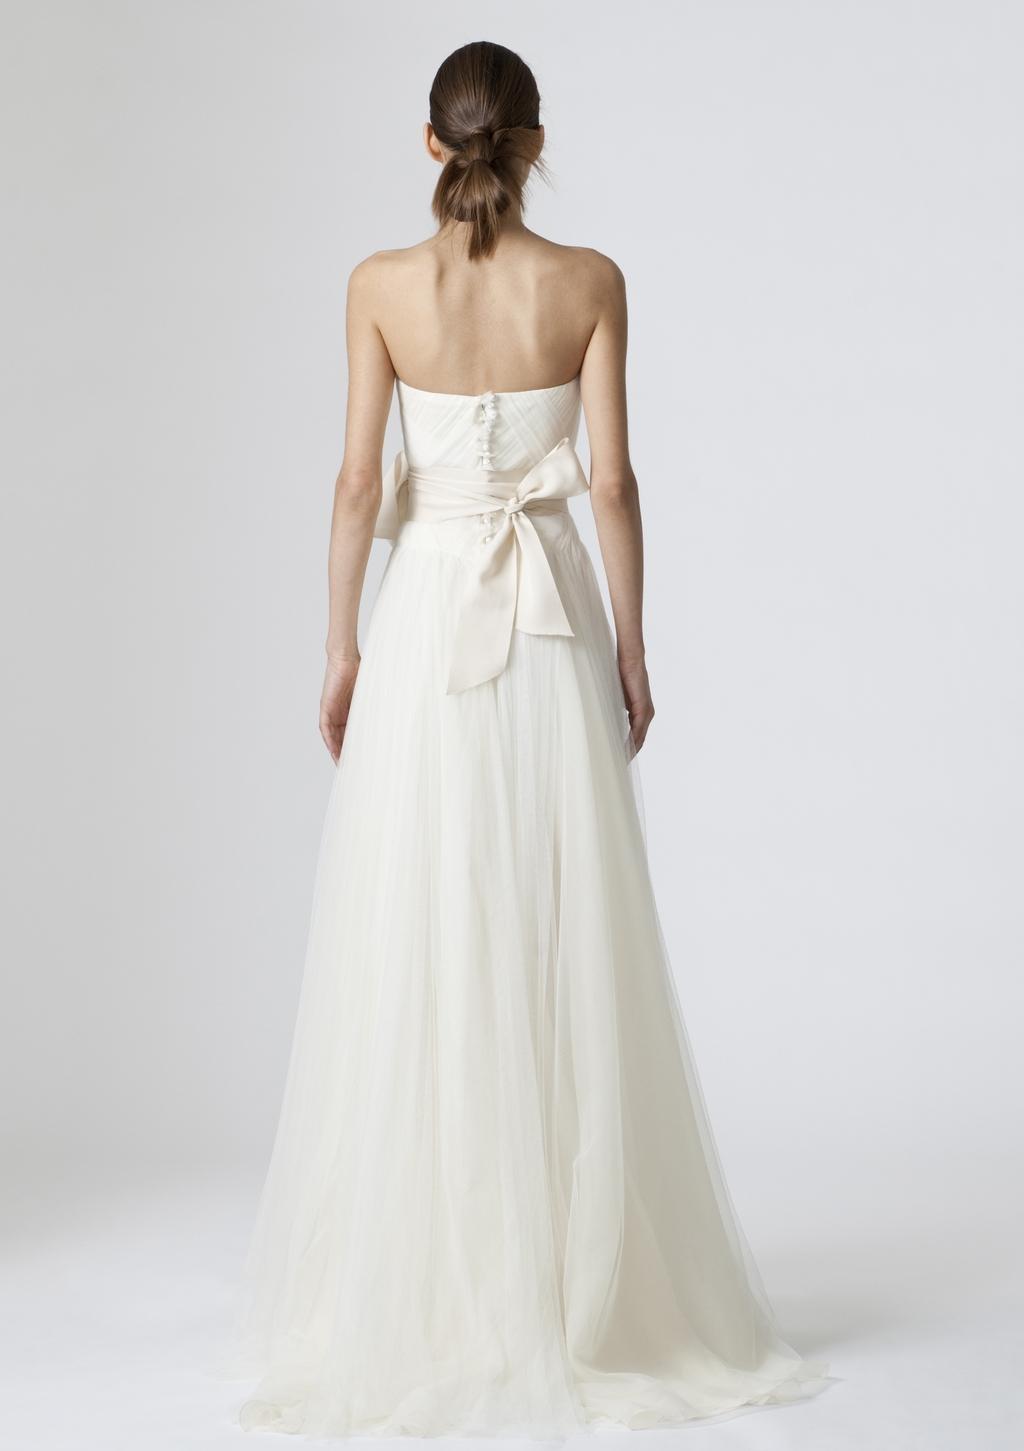 Vera-wang-wedding-dresses-spring-2010-11-back.full